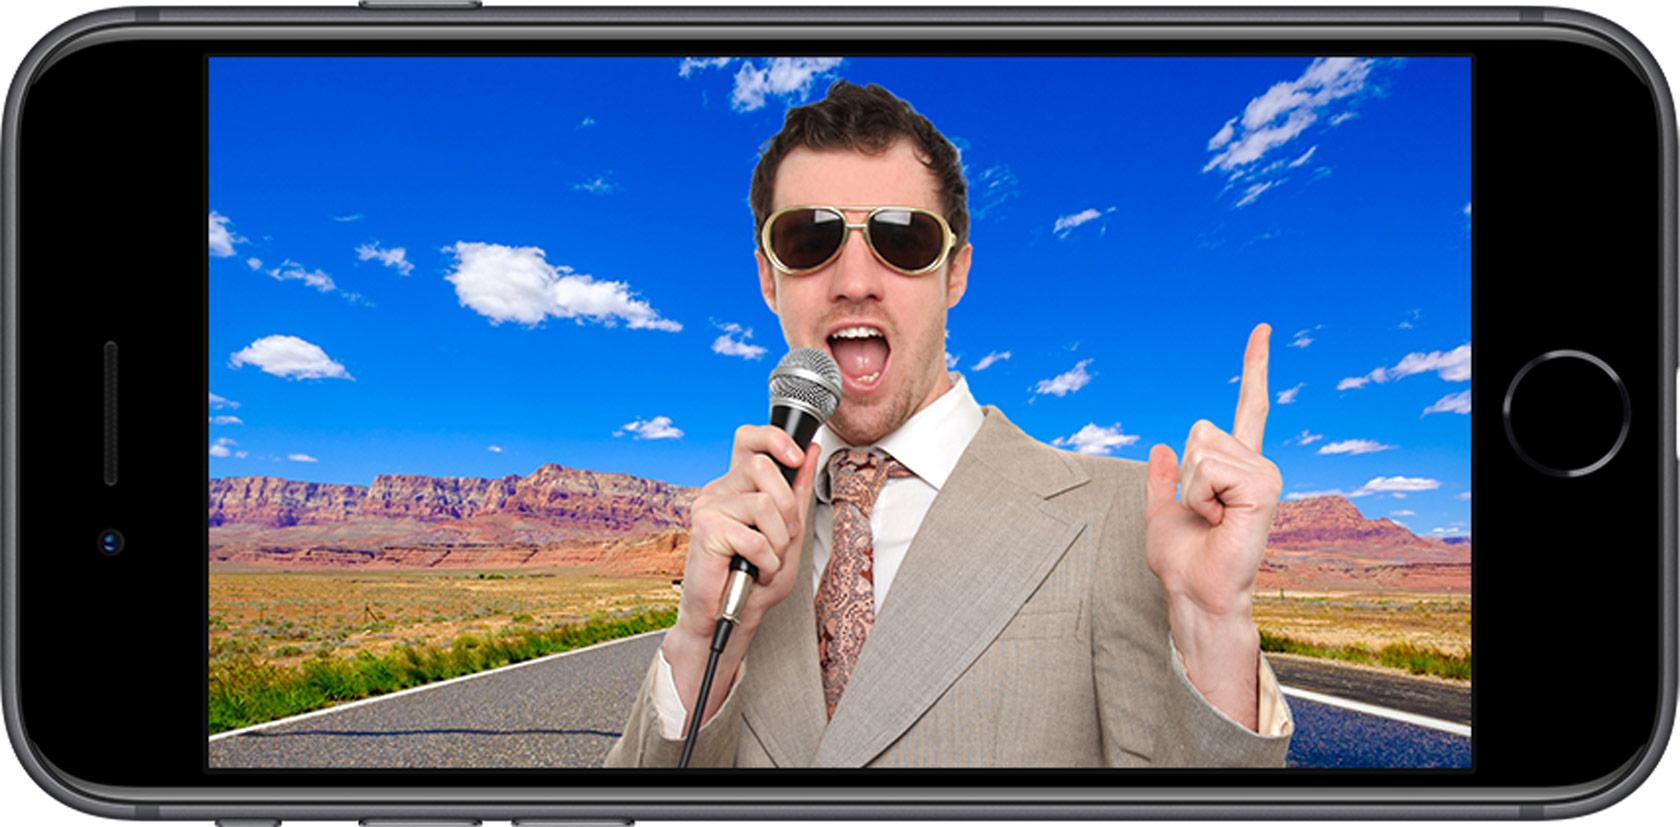 Roland Virtual Stage Camera